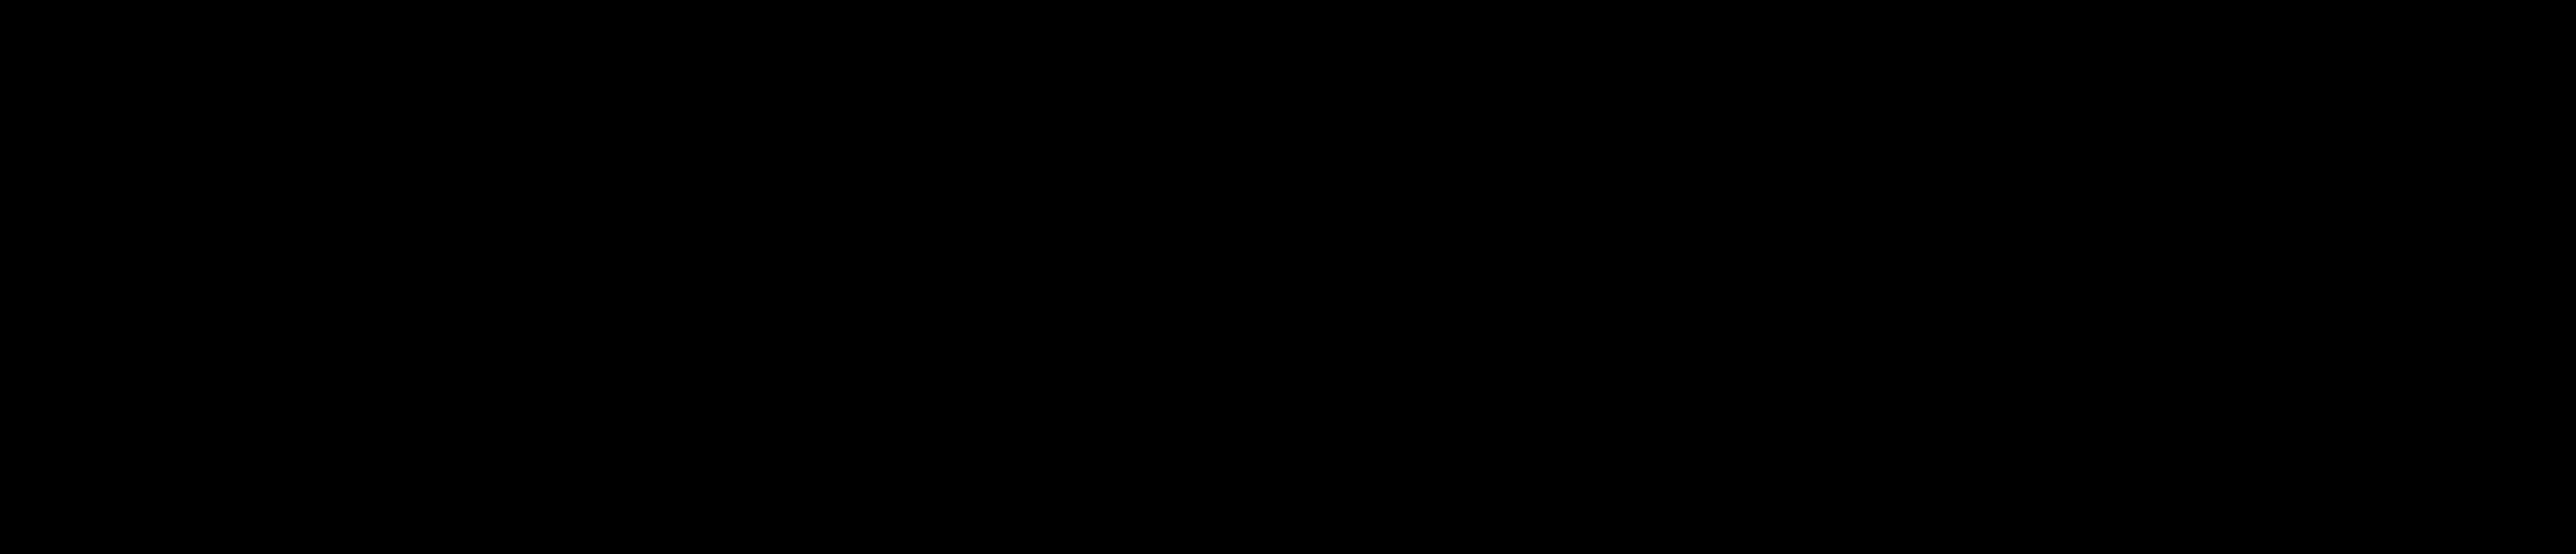 6Gorillas logo